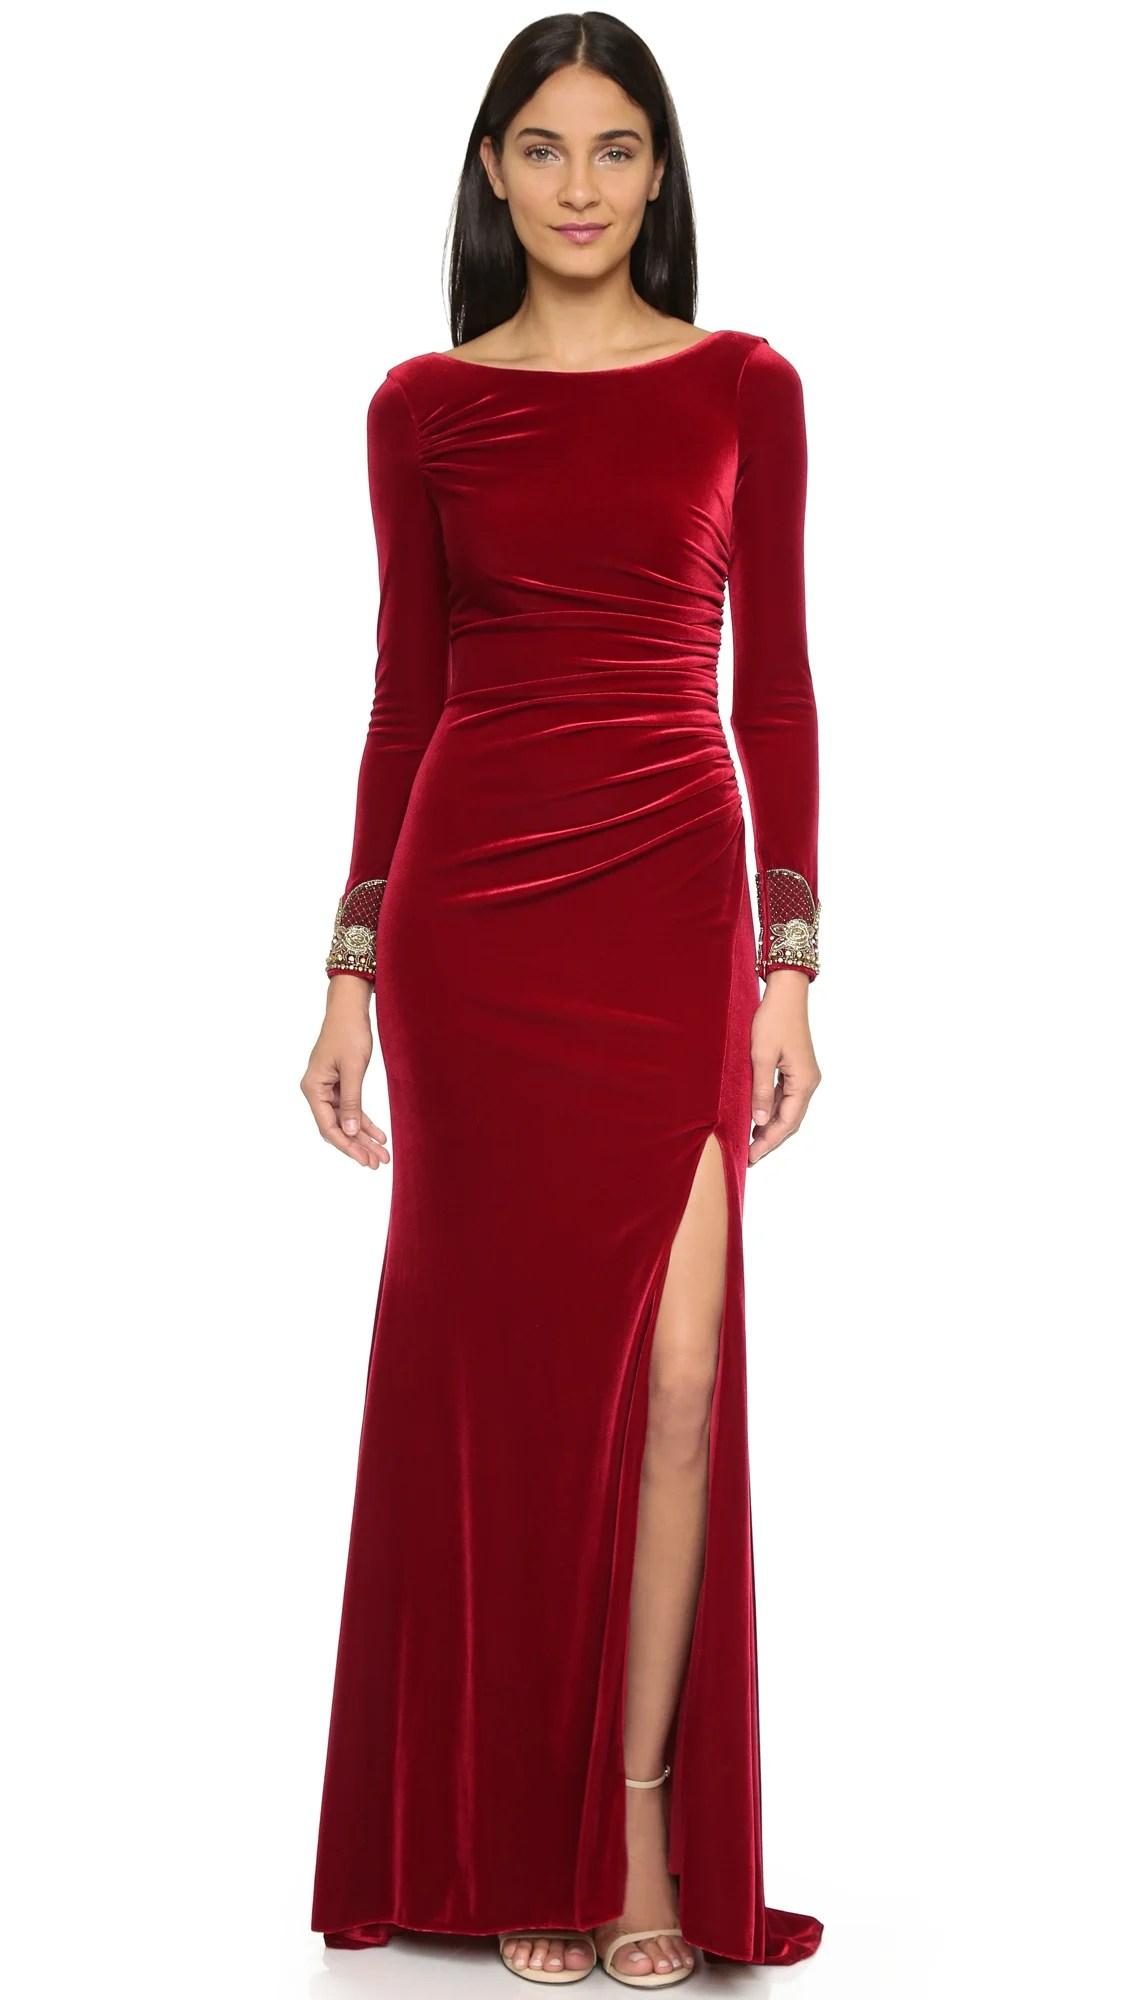 Distinctive Badgley Mischka Collection Crimson Velvet Long Sleeve Dress Crimson Product 3 234827688 Normal Long Sleeve Velvet Dress Zara Long Sleeve Velvet Dress Pinterest wedding dress Long Sleeve Velvet Dress